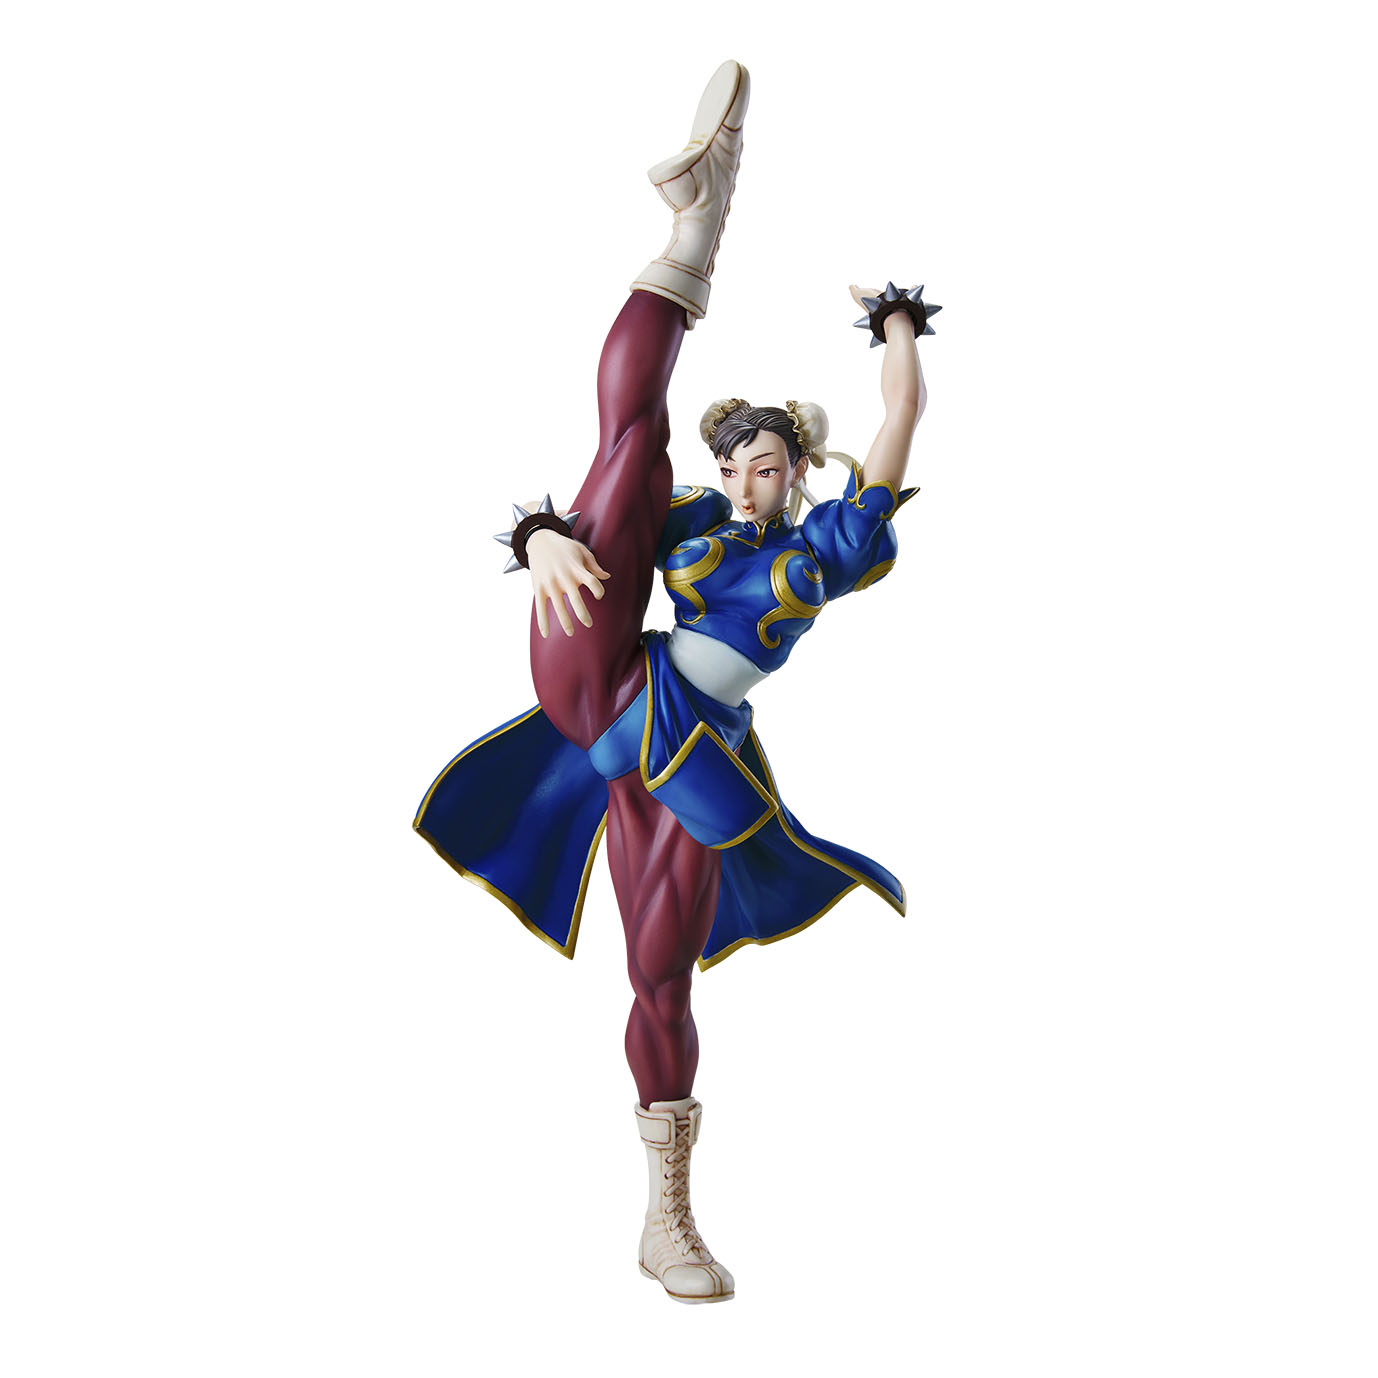 Kotobukiya Capcom Figure Builders Creators Model Chun-Li, PVC Figure Statue